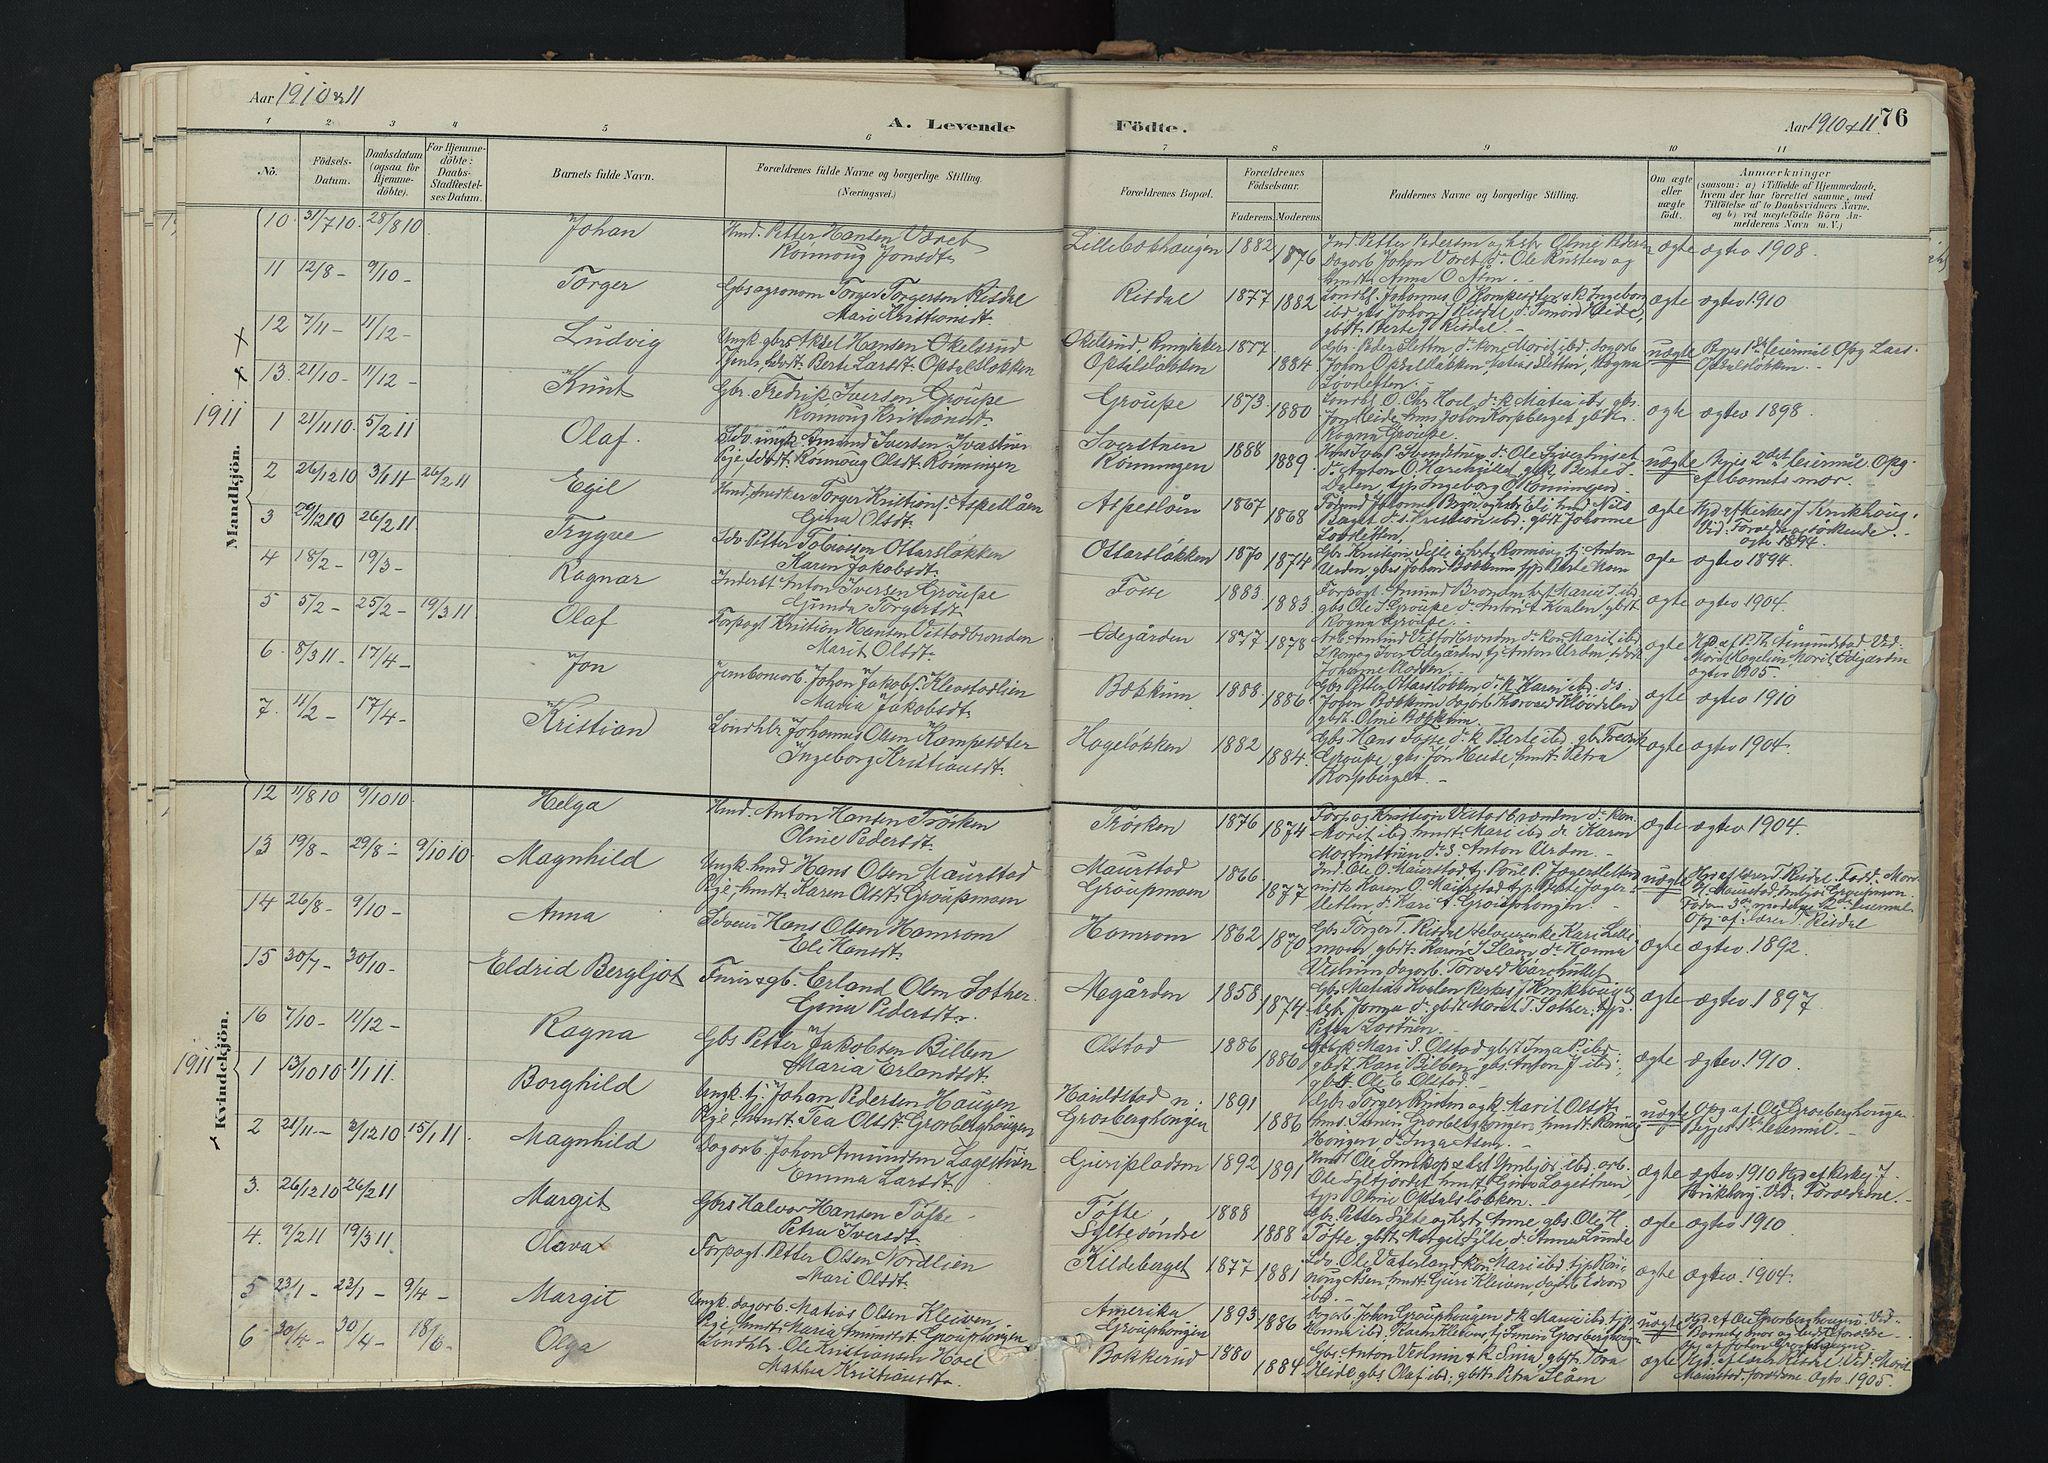 SAH, Nord-Fron prestekontor, Ministerialbok nr. 5, 1884-1914, s. 76